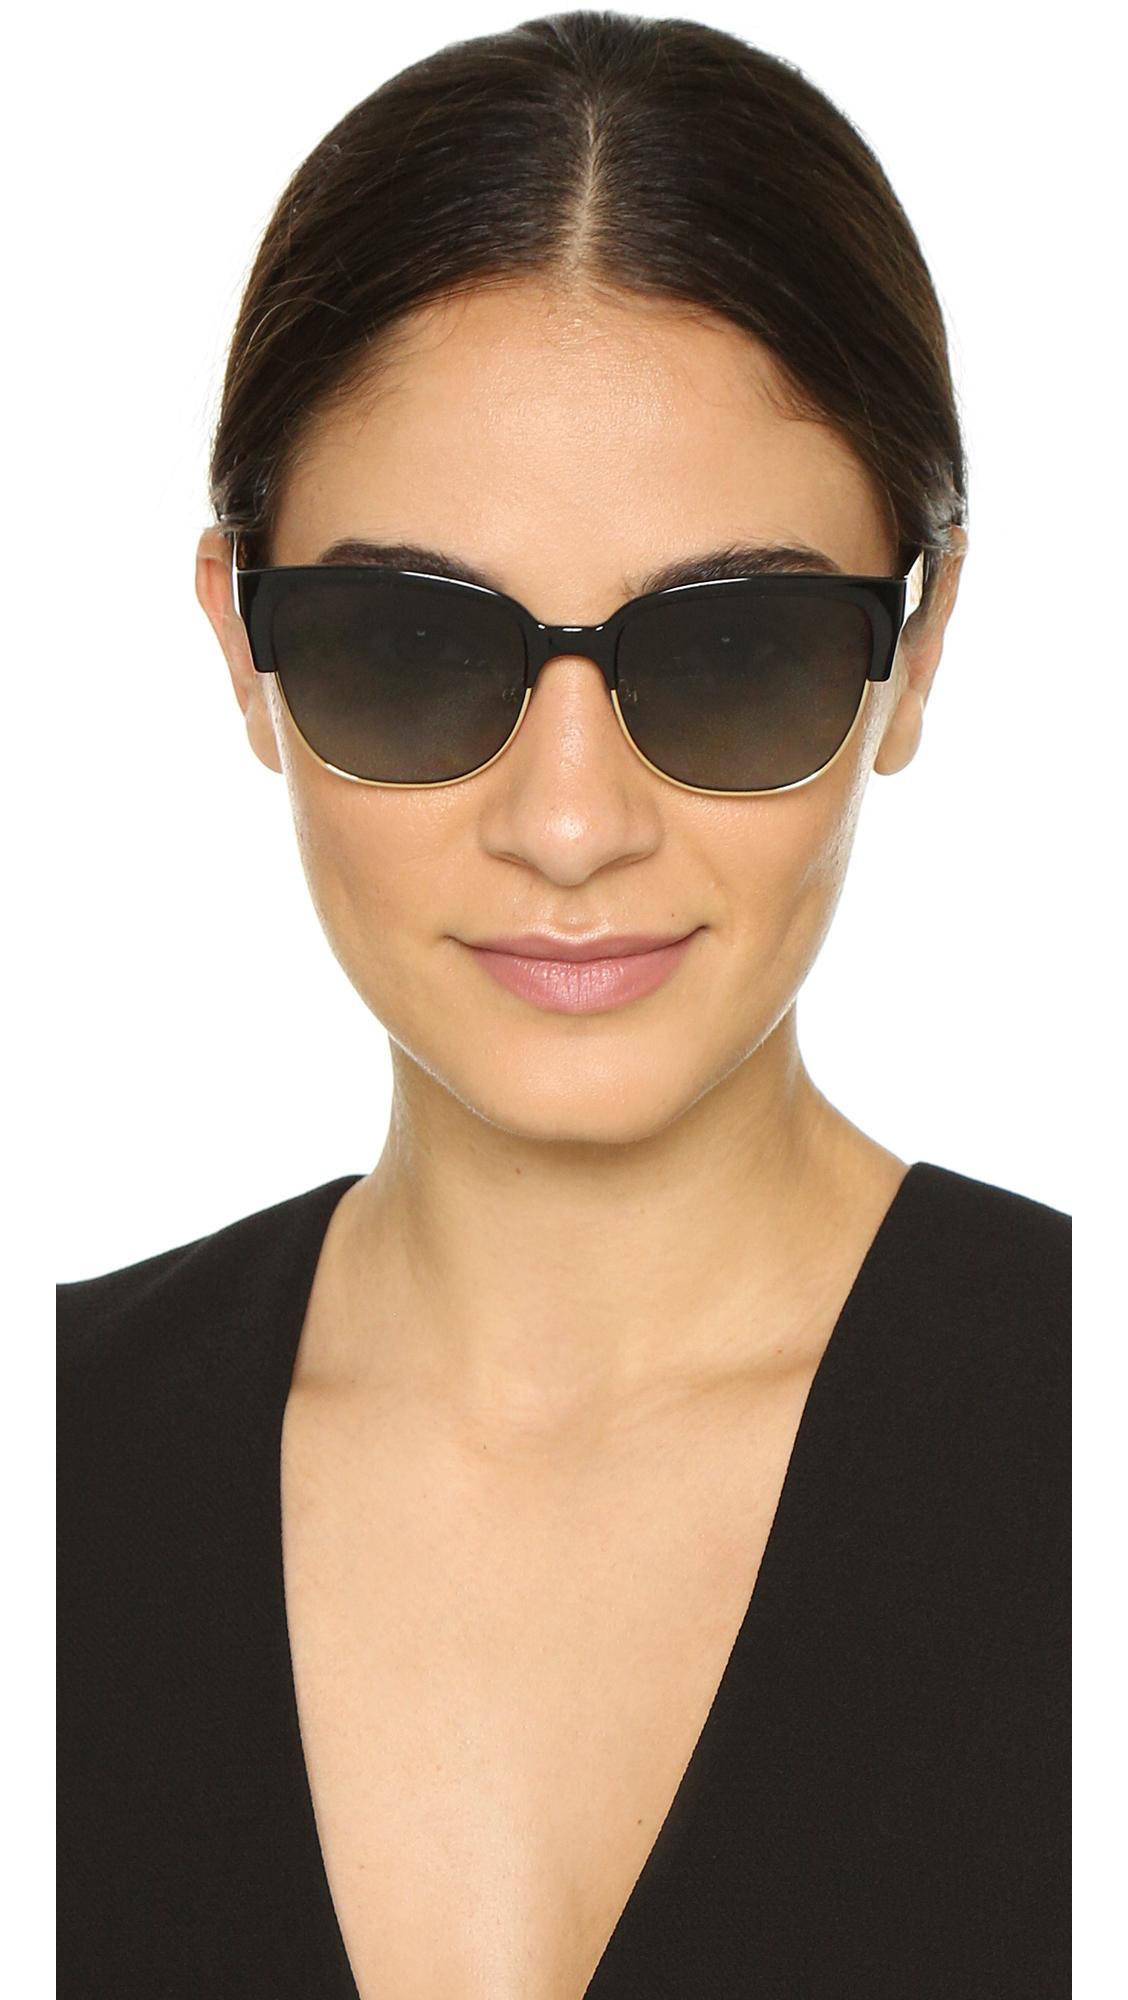 05542d9b009 Lyst - Tory Burch Rimless Bottom Polarized Sunglasses - Black Gold ...